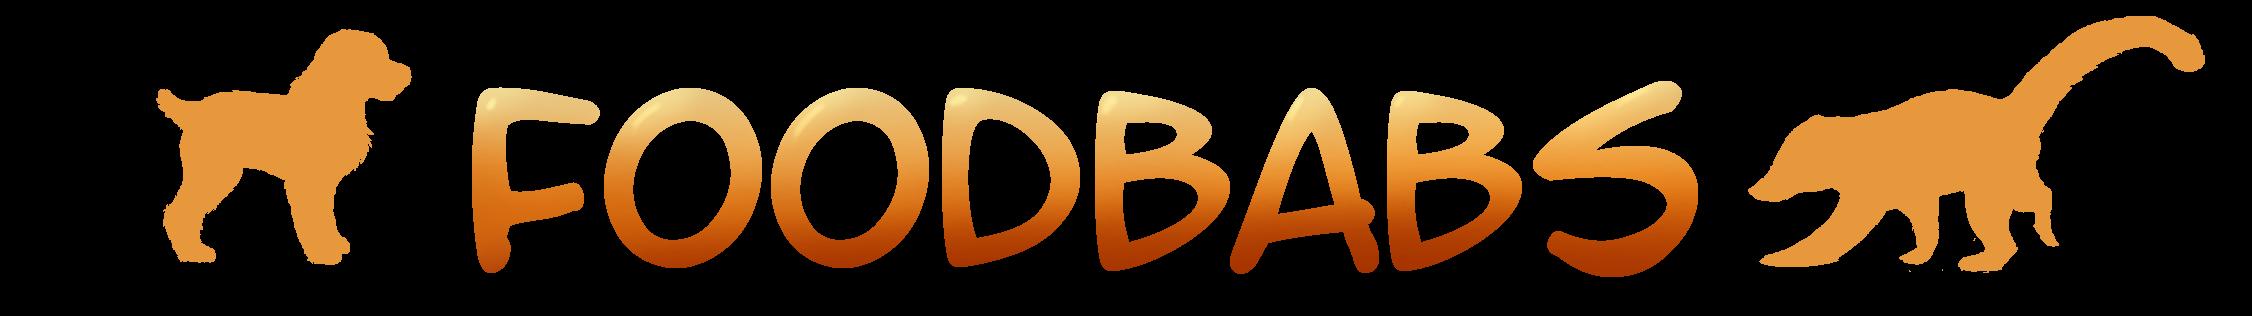 Foodbabs won 330<small>rd</small> last week on BBOGD.